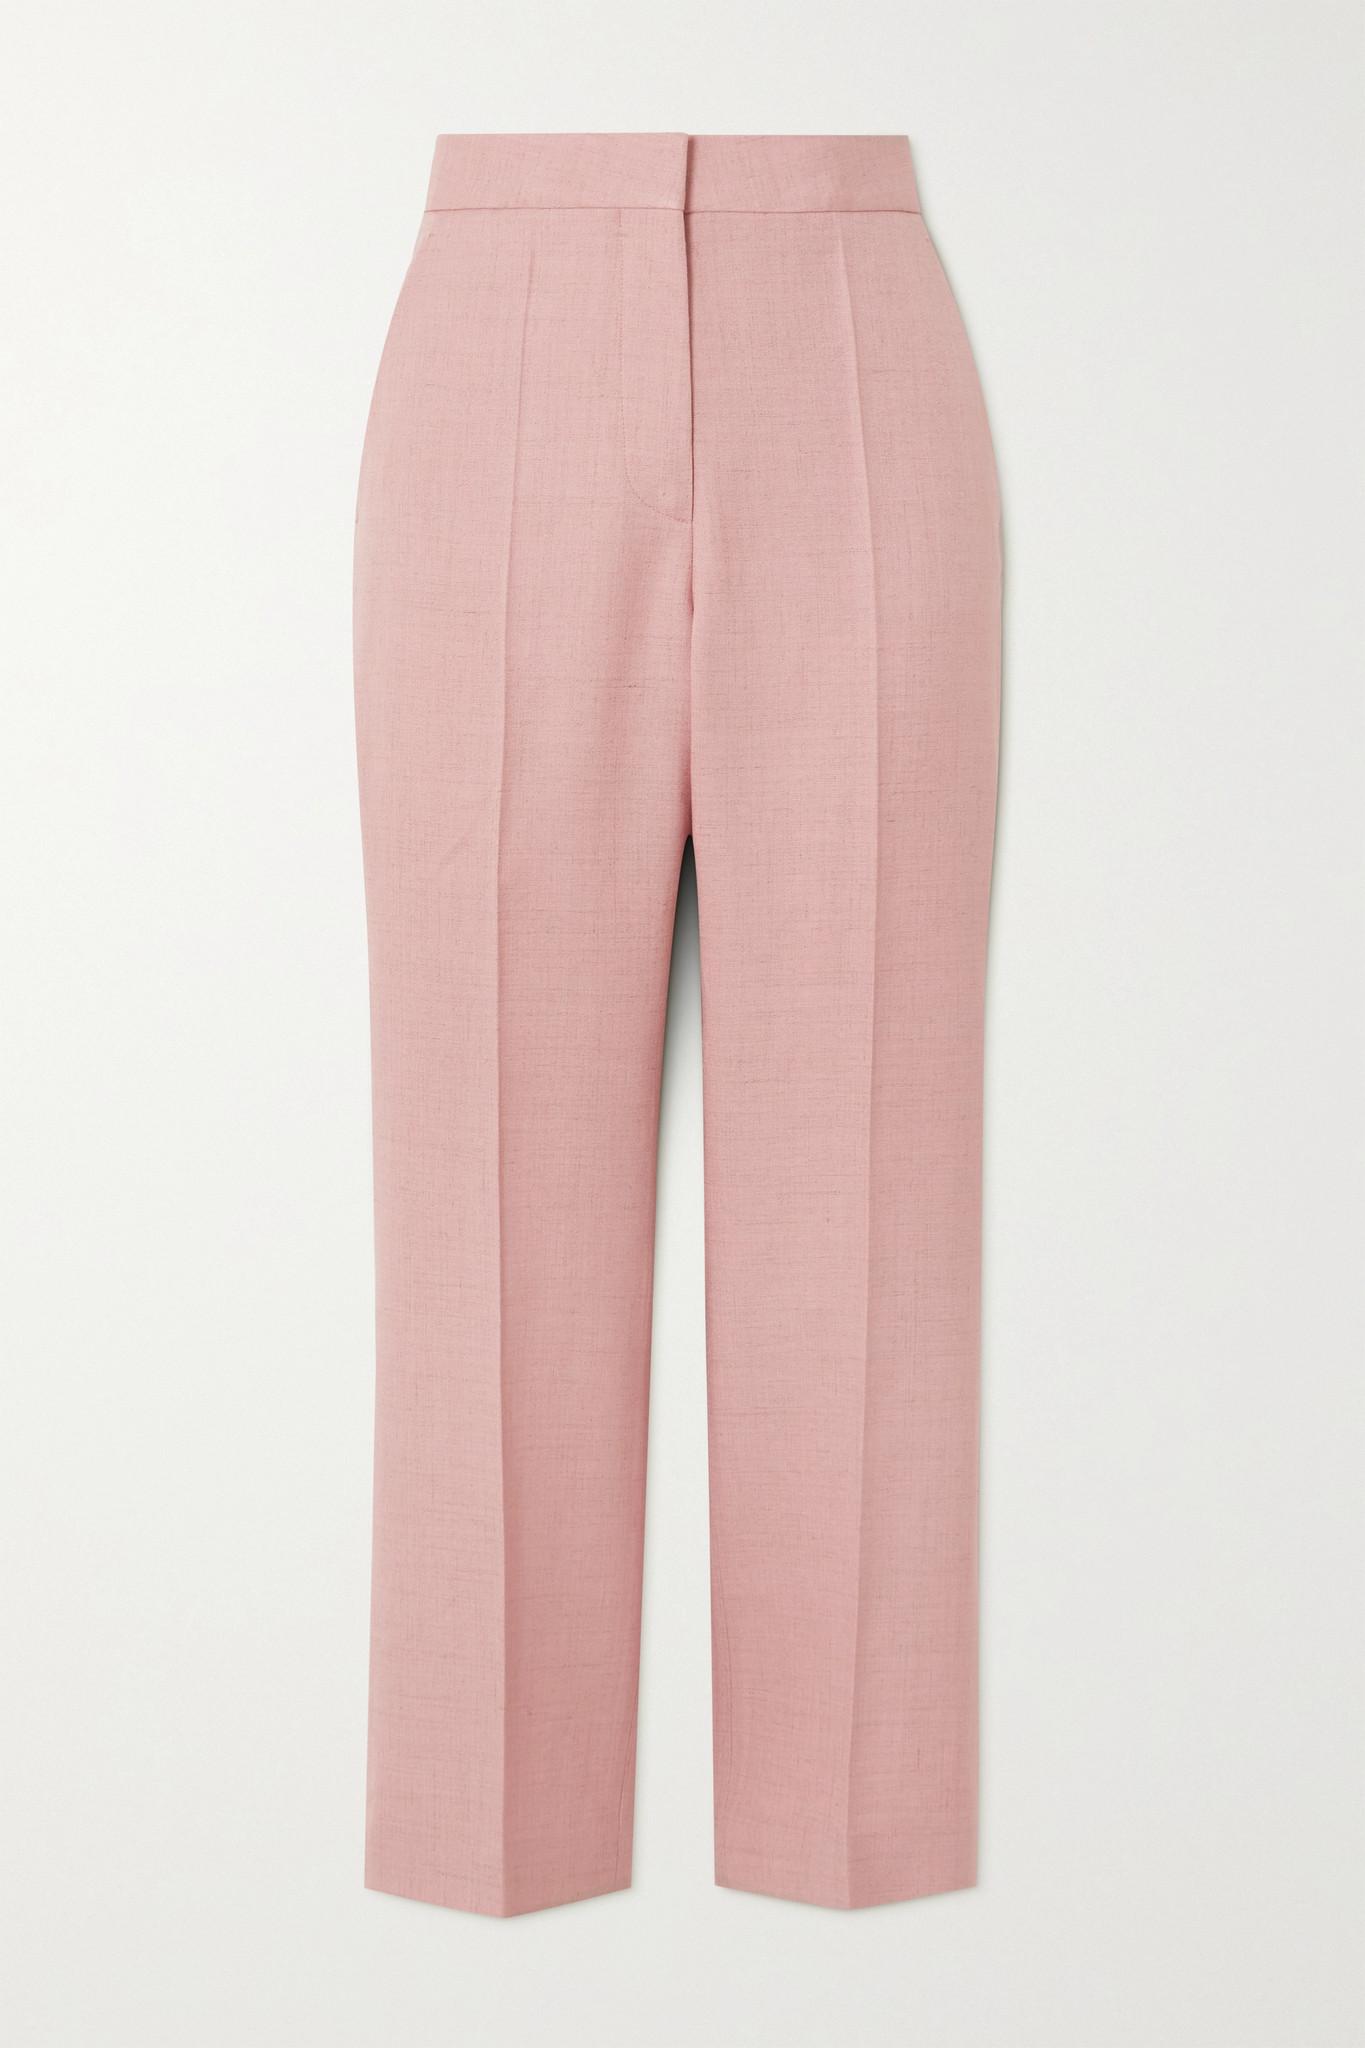 STELLA MCCARTNEY - Carlie Cropped Woven Straight-leg Pants - Pink - IT38